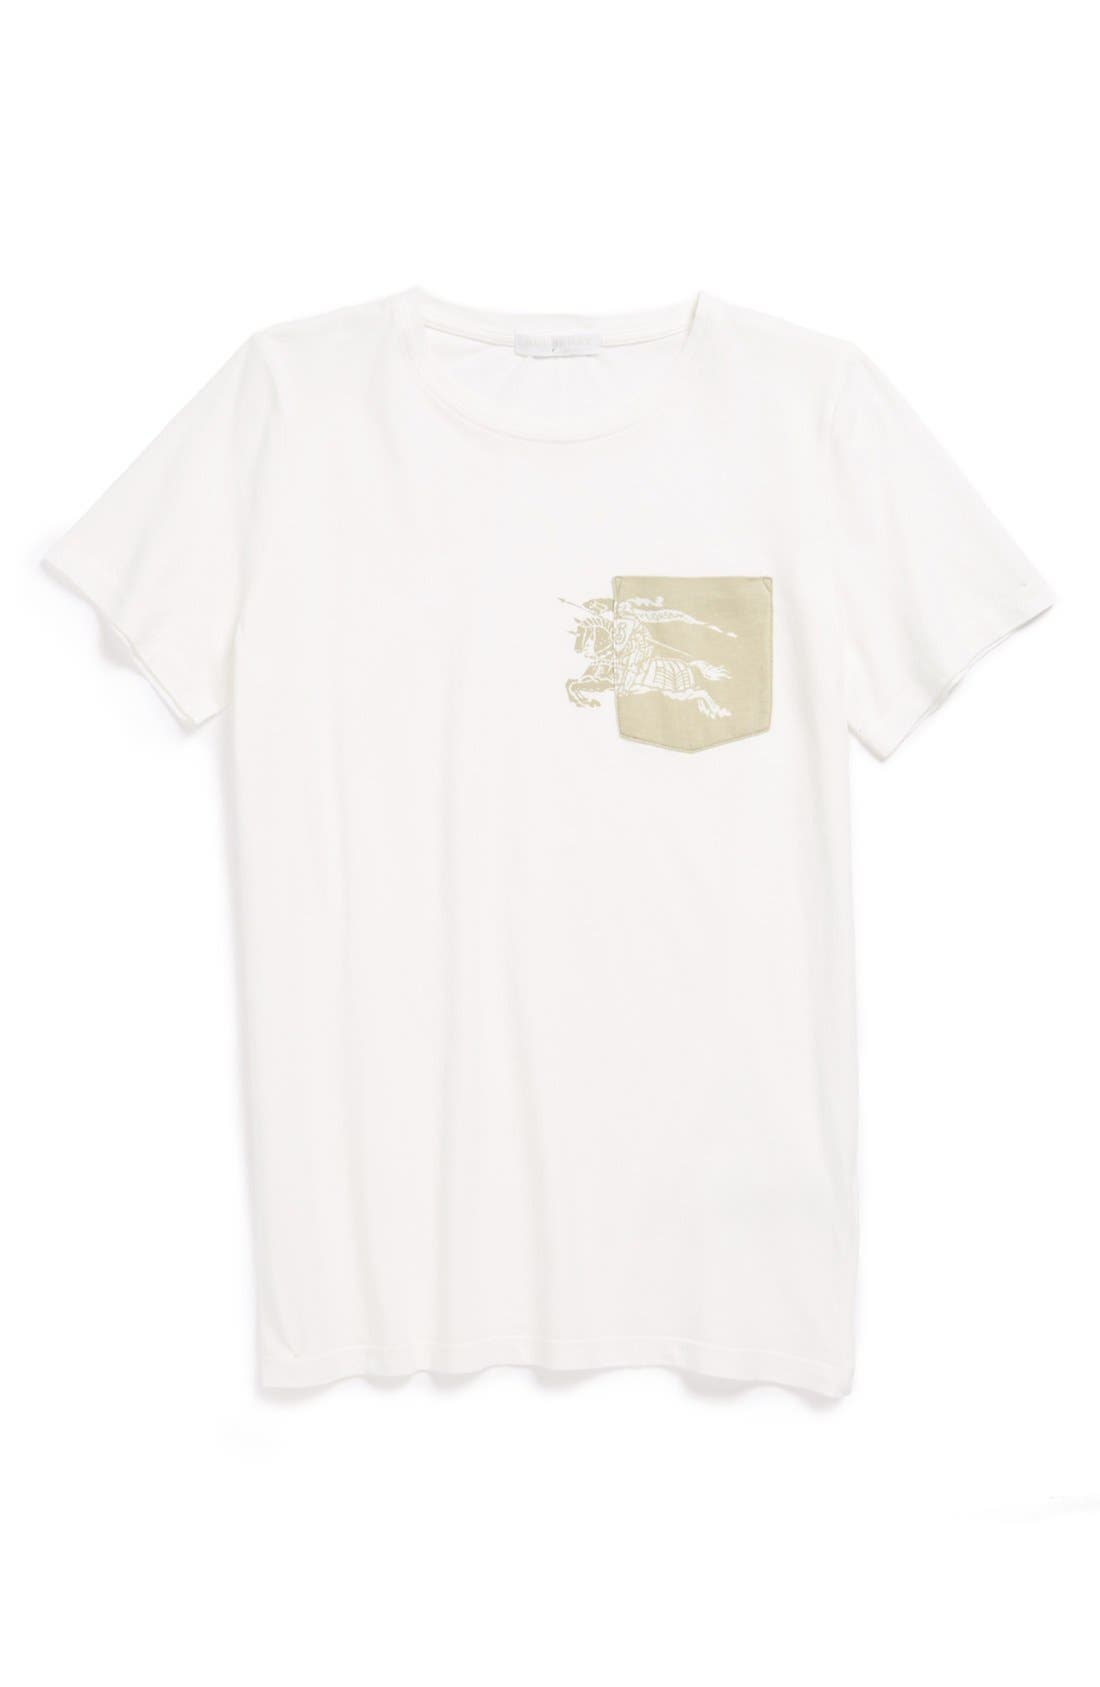 Alternate Image 1 Selected - Burberry 'Hackett' T-Shirt (Toddler Boys, Little Boys & Big Boys)